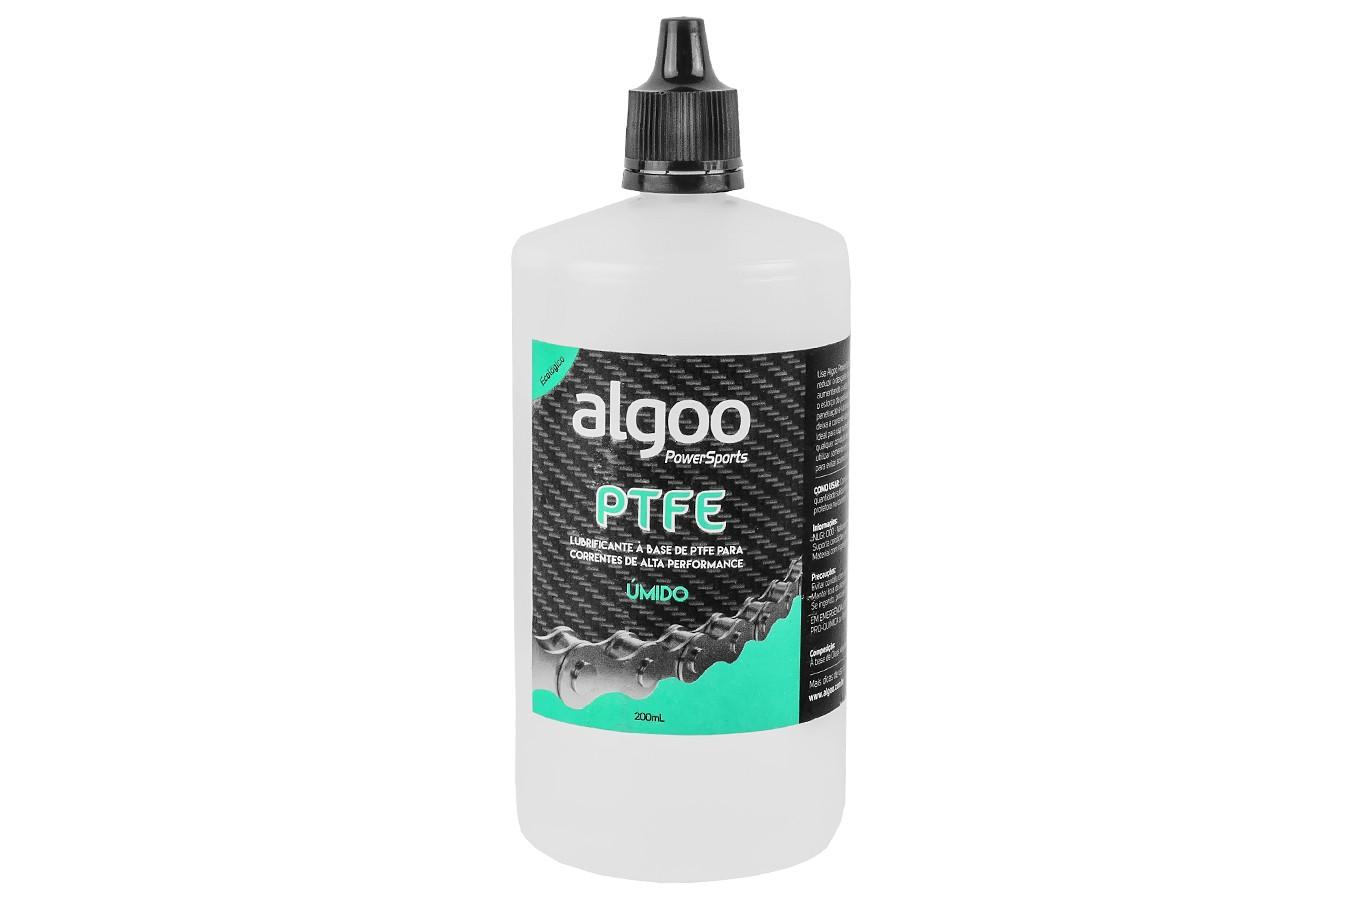 Lubrificante PTFE (Teflon) Úmido 200ml - Algoo